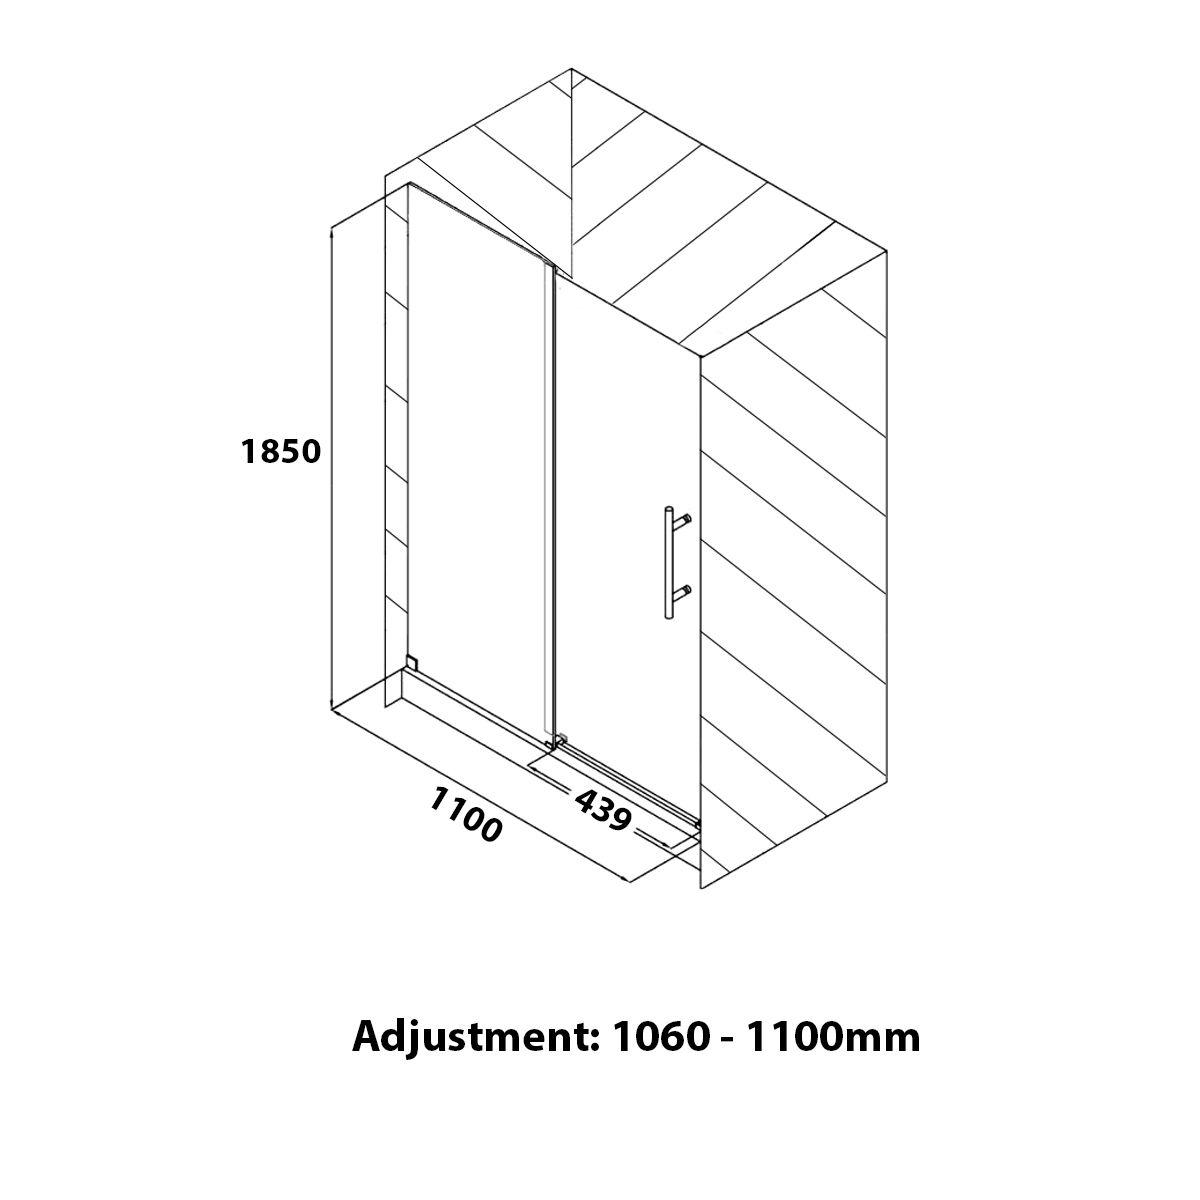 coral6mmslidingshowerenclosure1100x760mmdimensions1